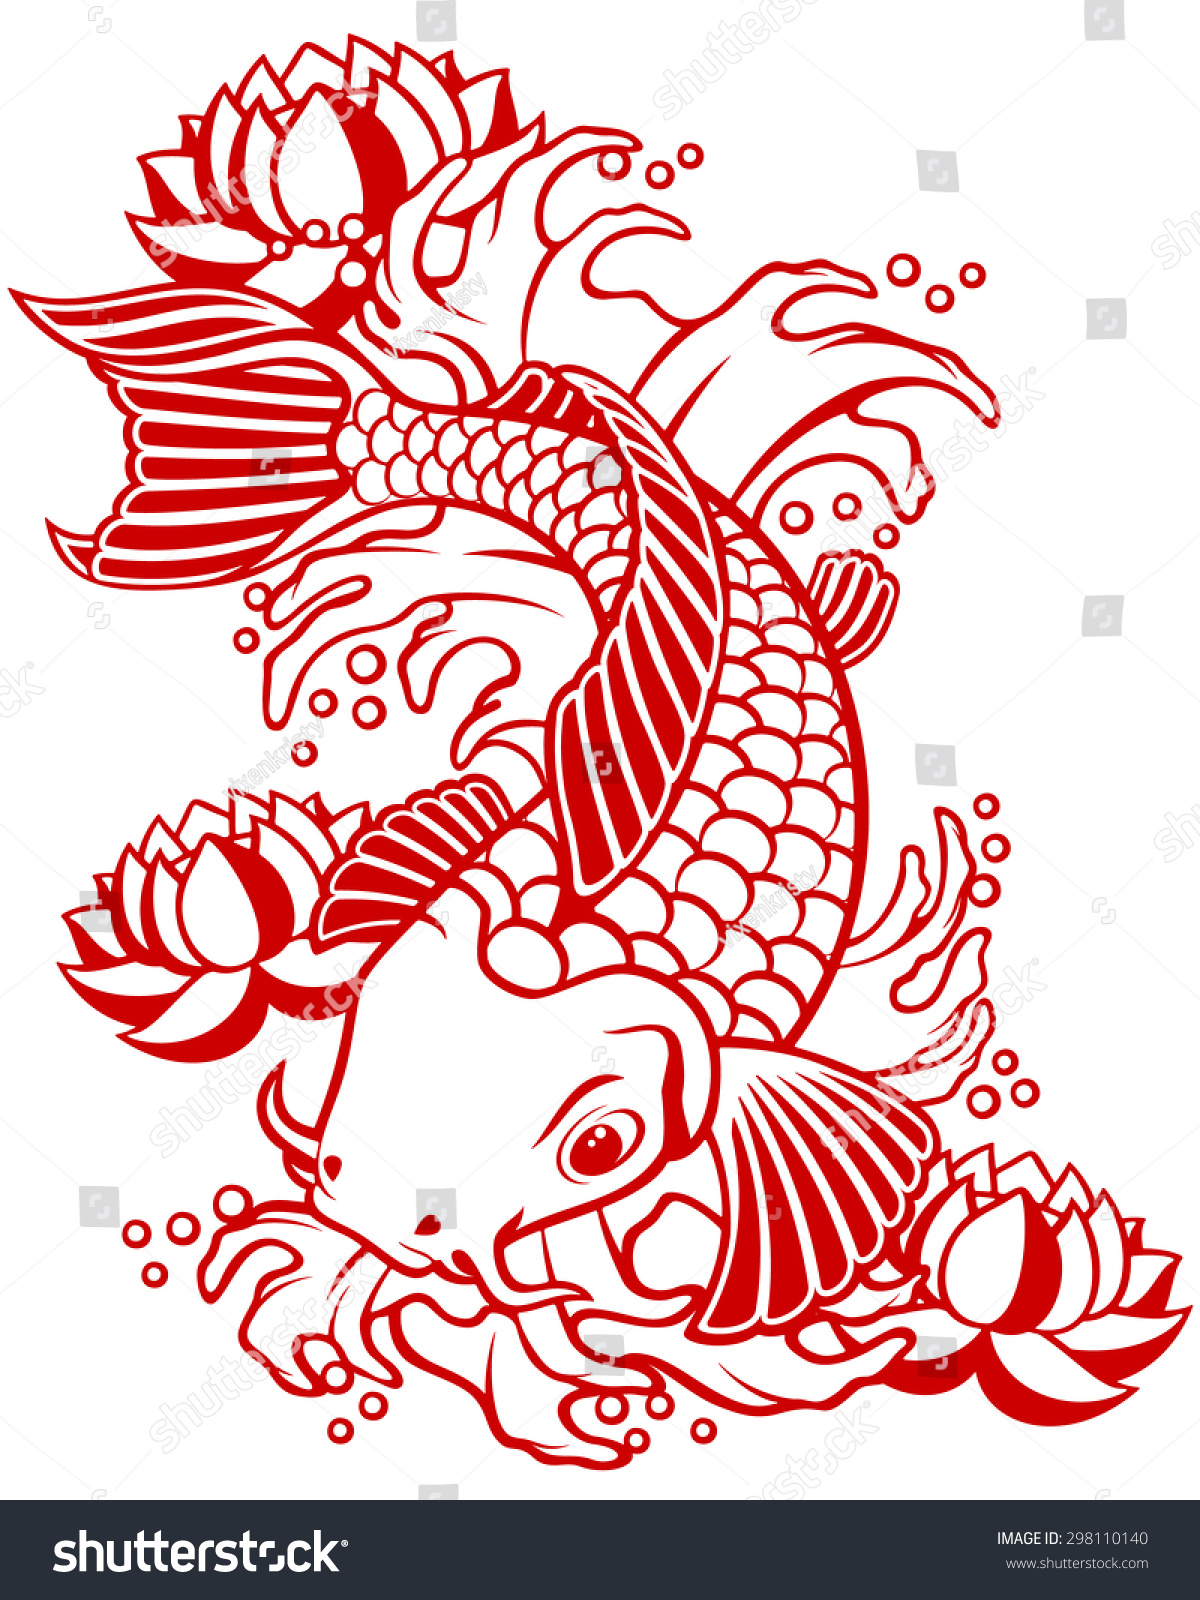 Koi Fish Vector Illustration Stock Vector 298110140 - Shutterstock